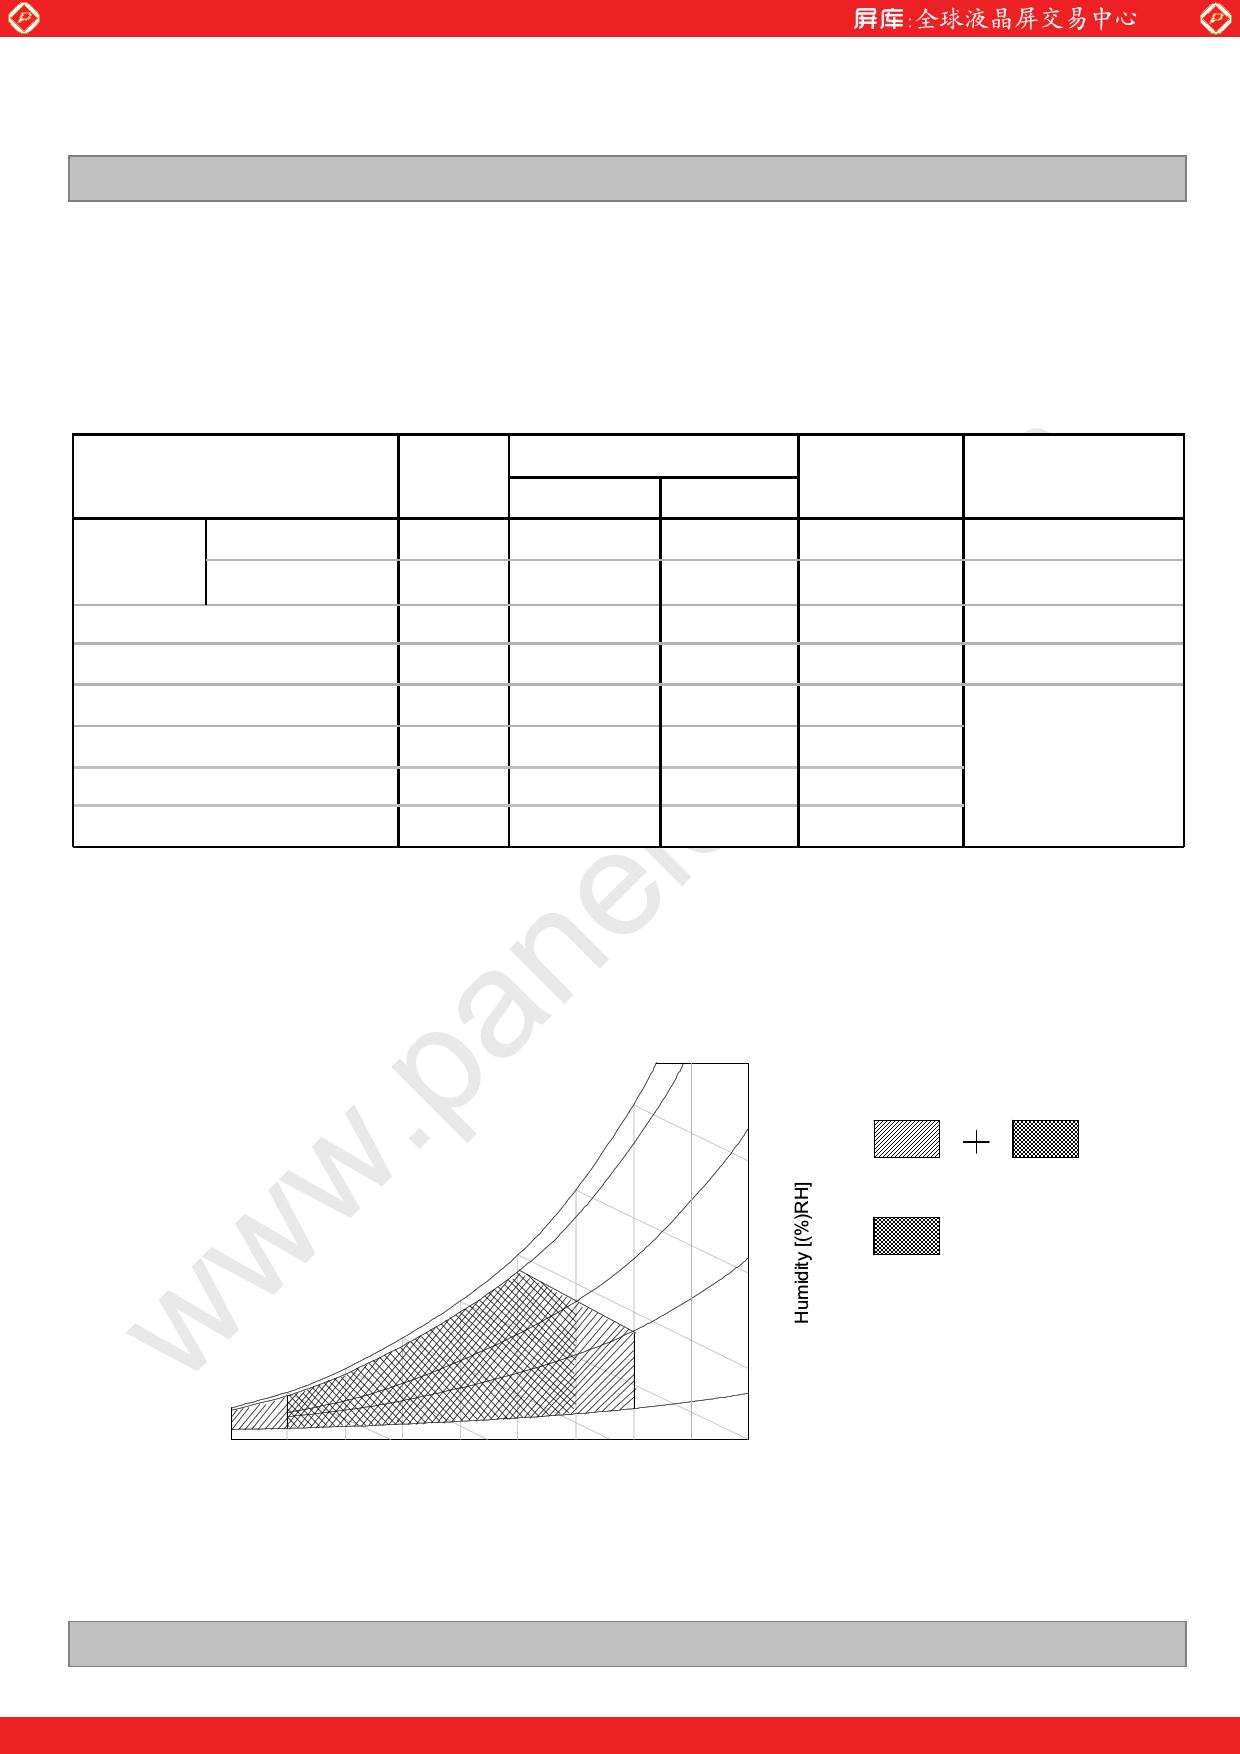 LC320WUD-SBA3 pdf